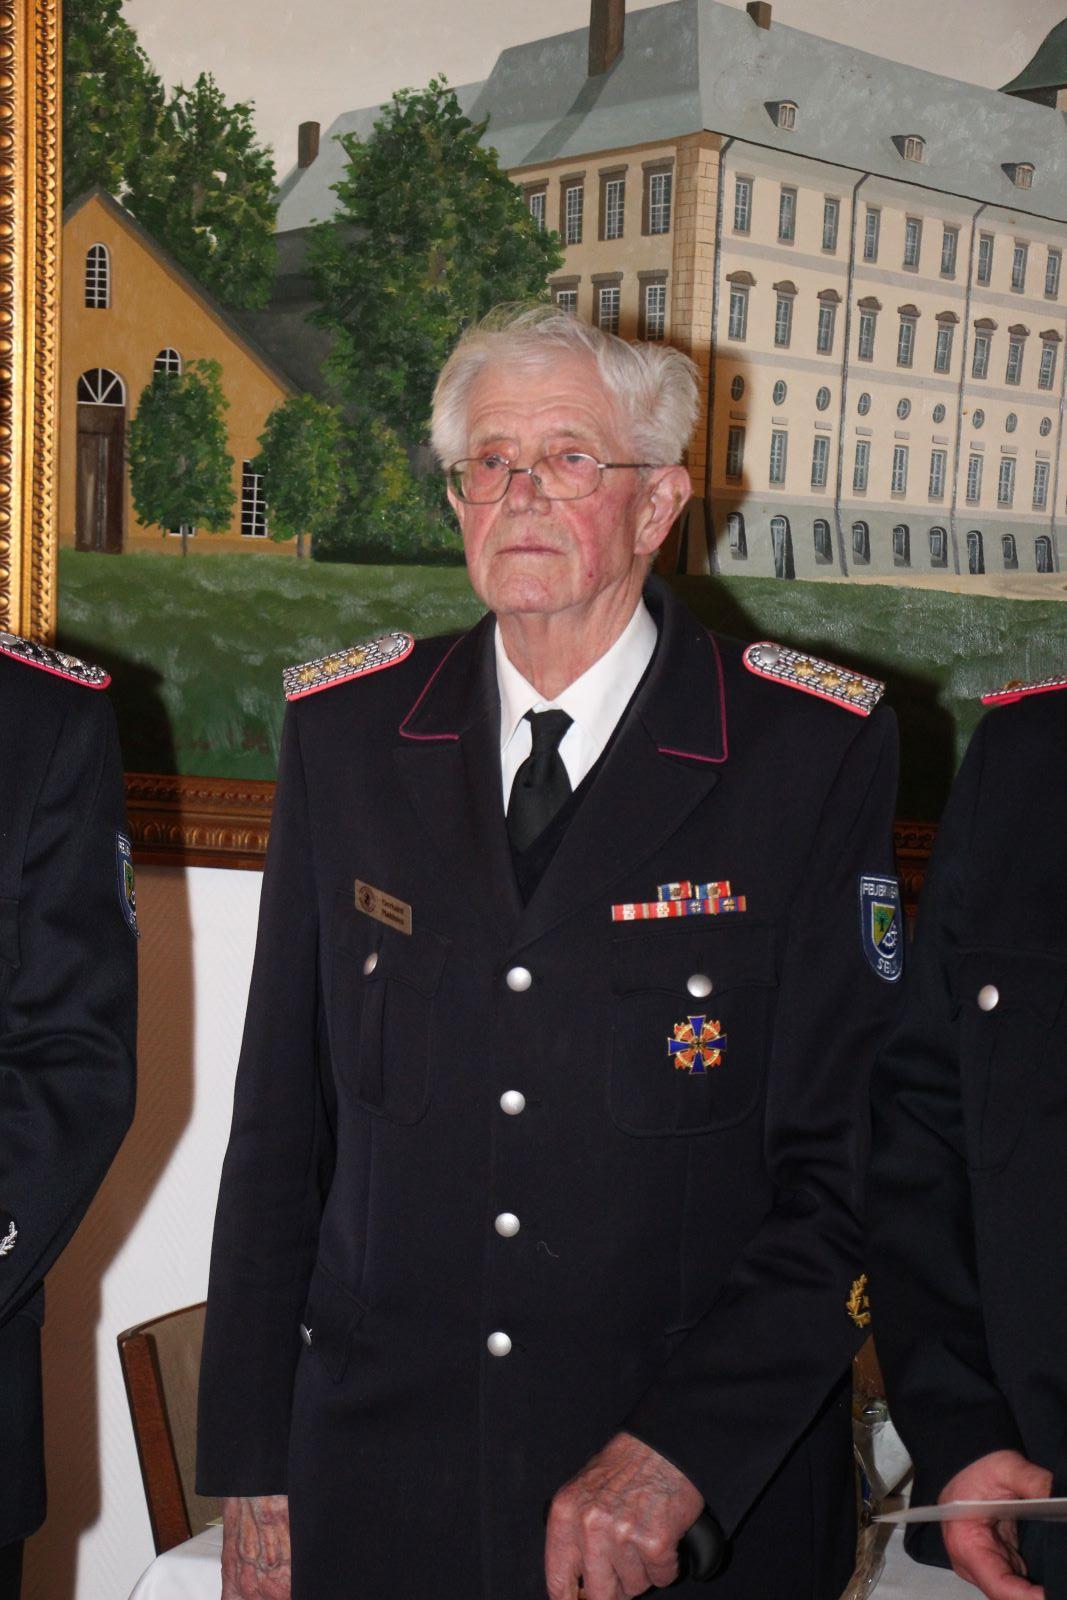 Gerhard Matthies